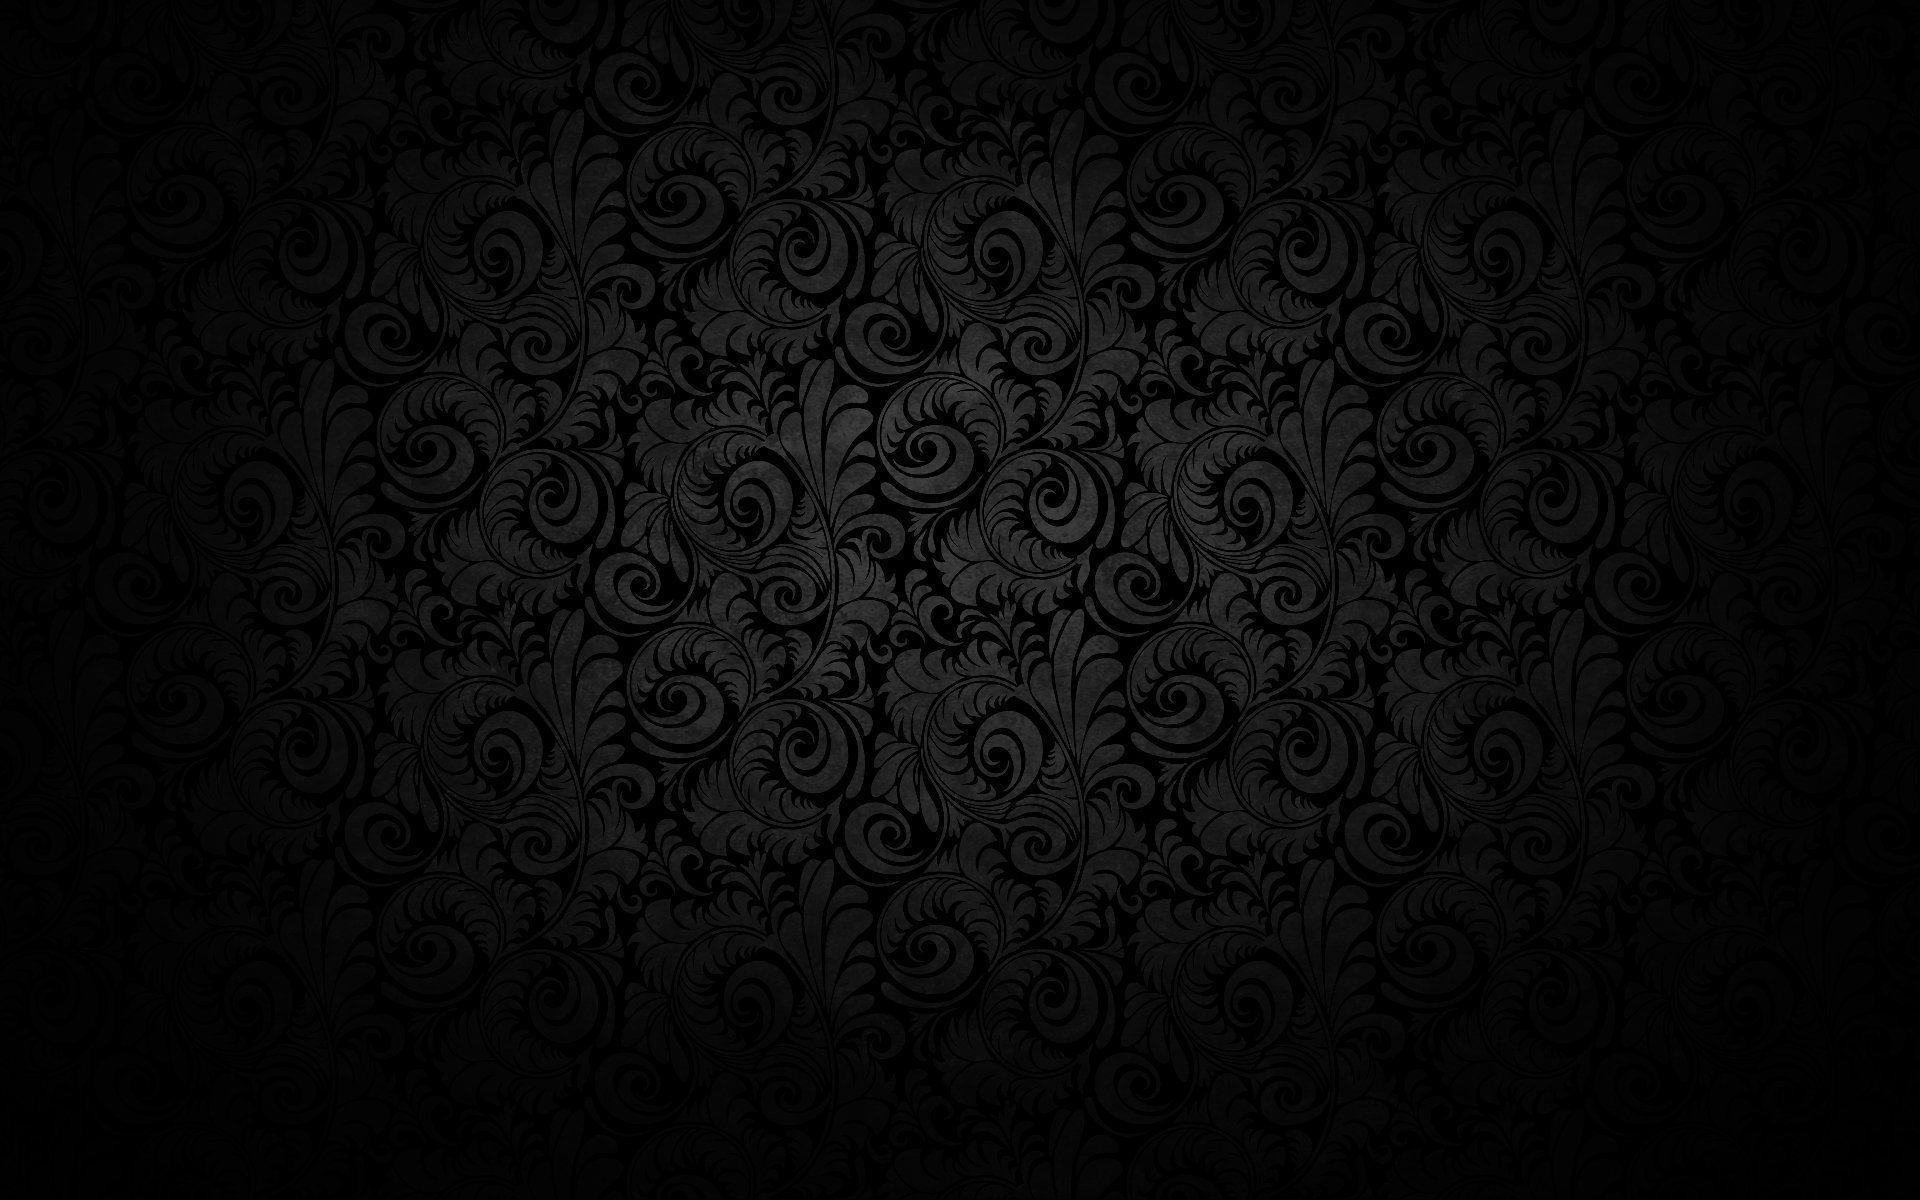 Dark Web Wallpapers Top Free Dark Web Backgrounds Wallpaperaccess